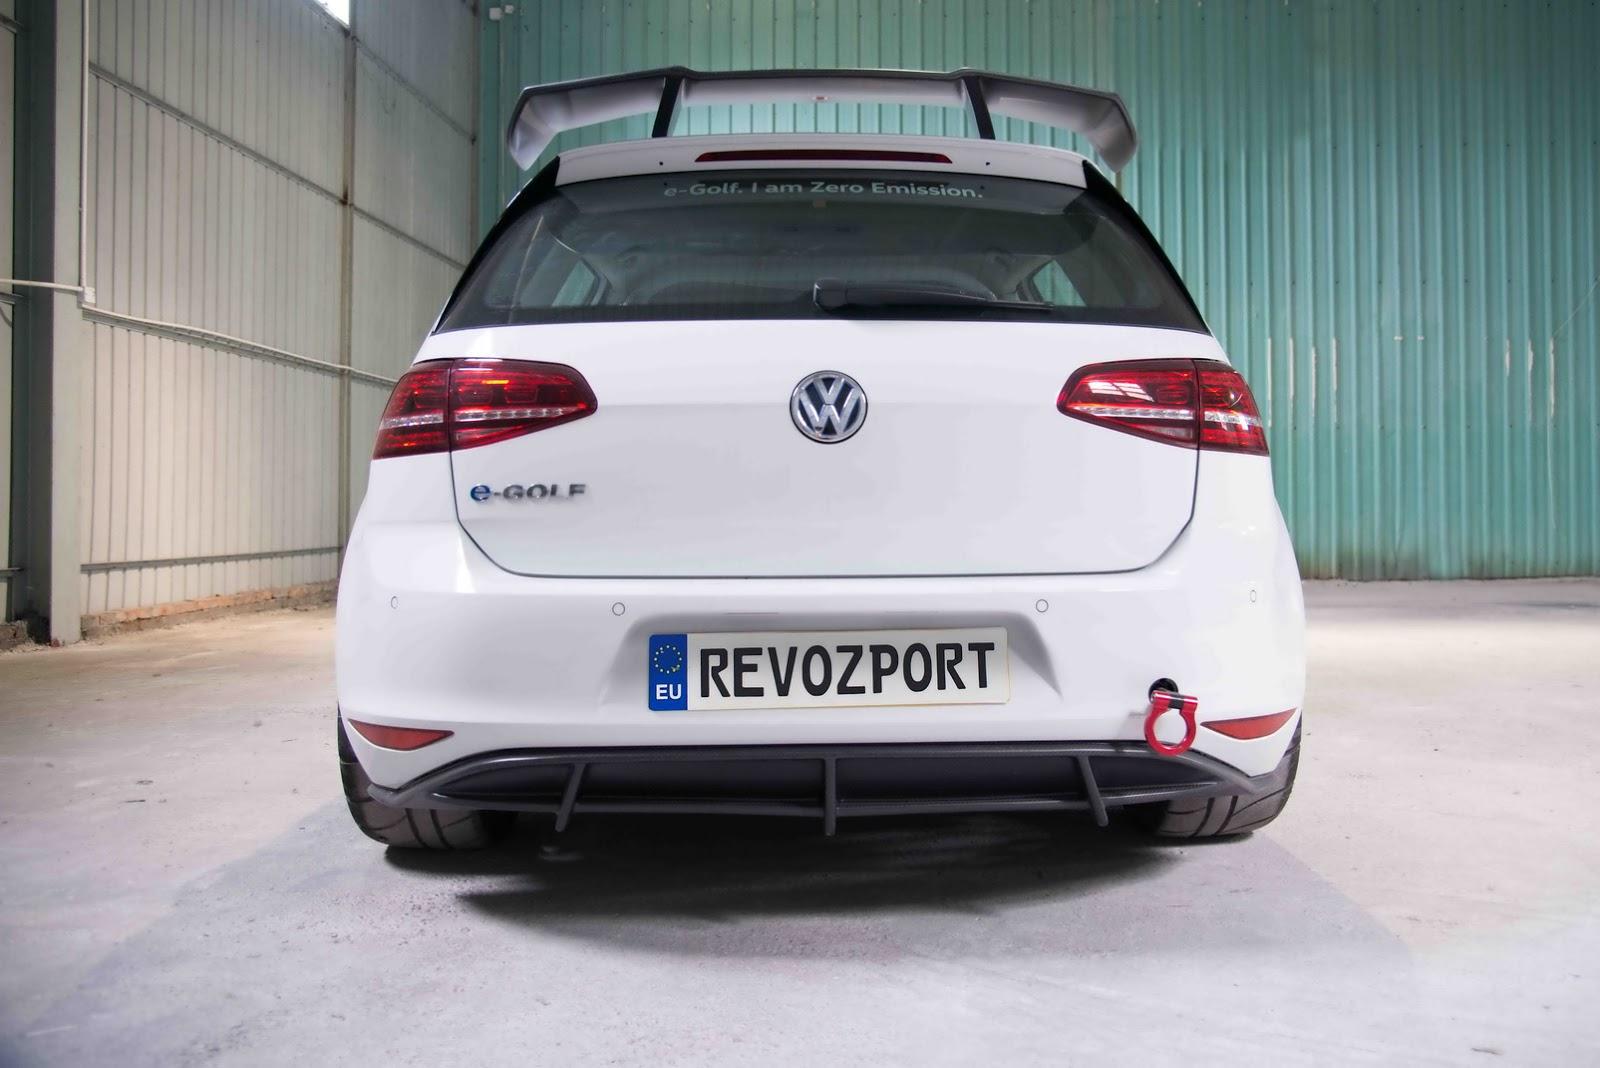 Volkswagen_e-Golf_Razor_7E_by_RevoZport_07